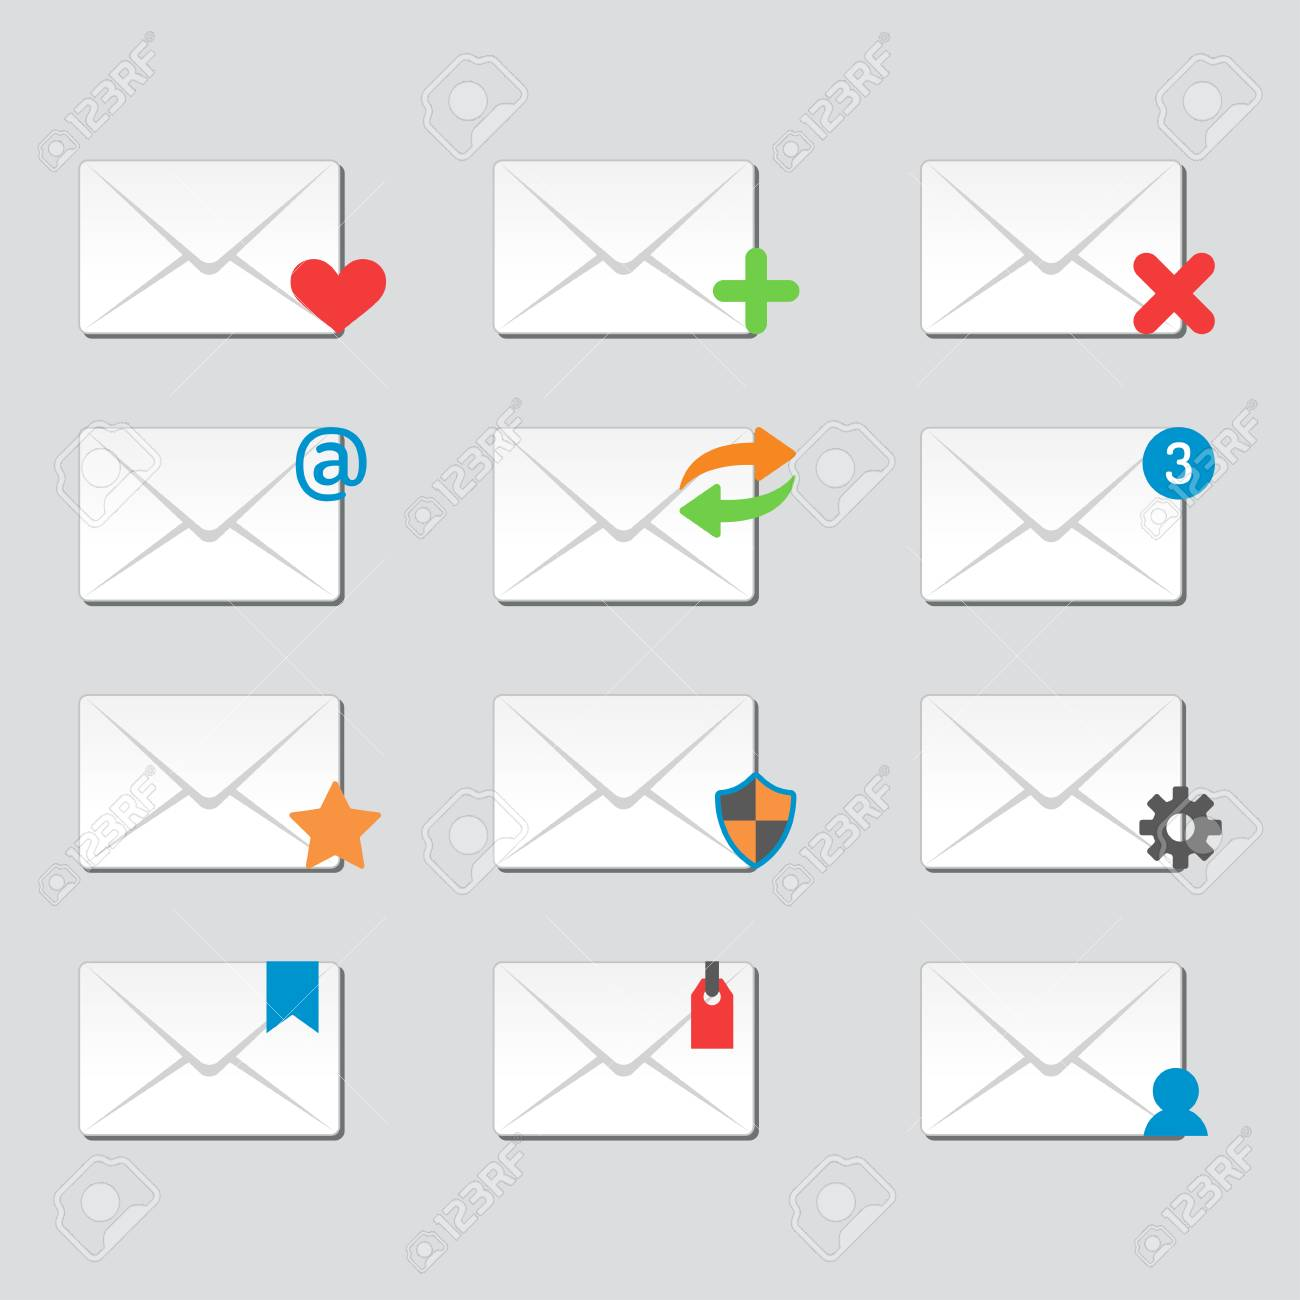 Email Umschlag Cover Icons Kommunikation Und Büro Korrespondenz